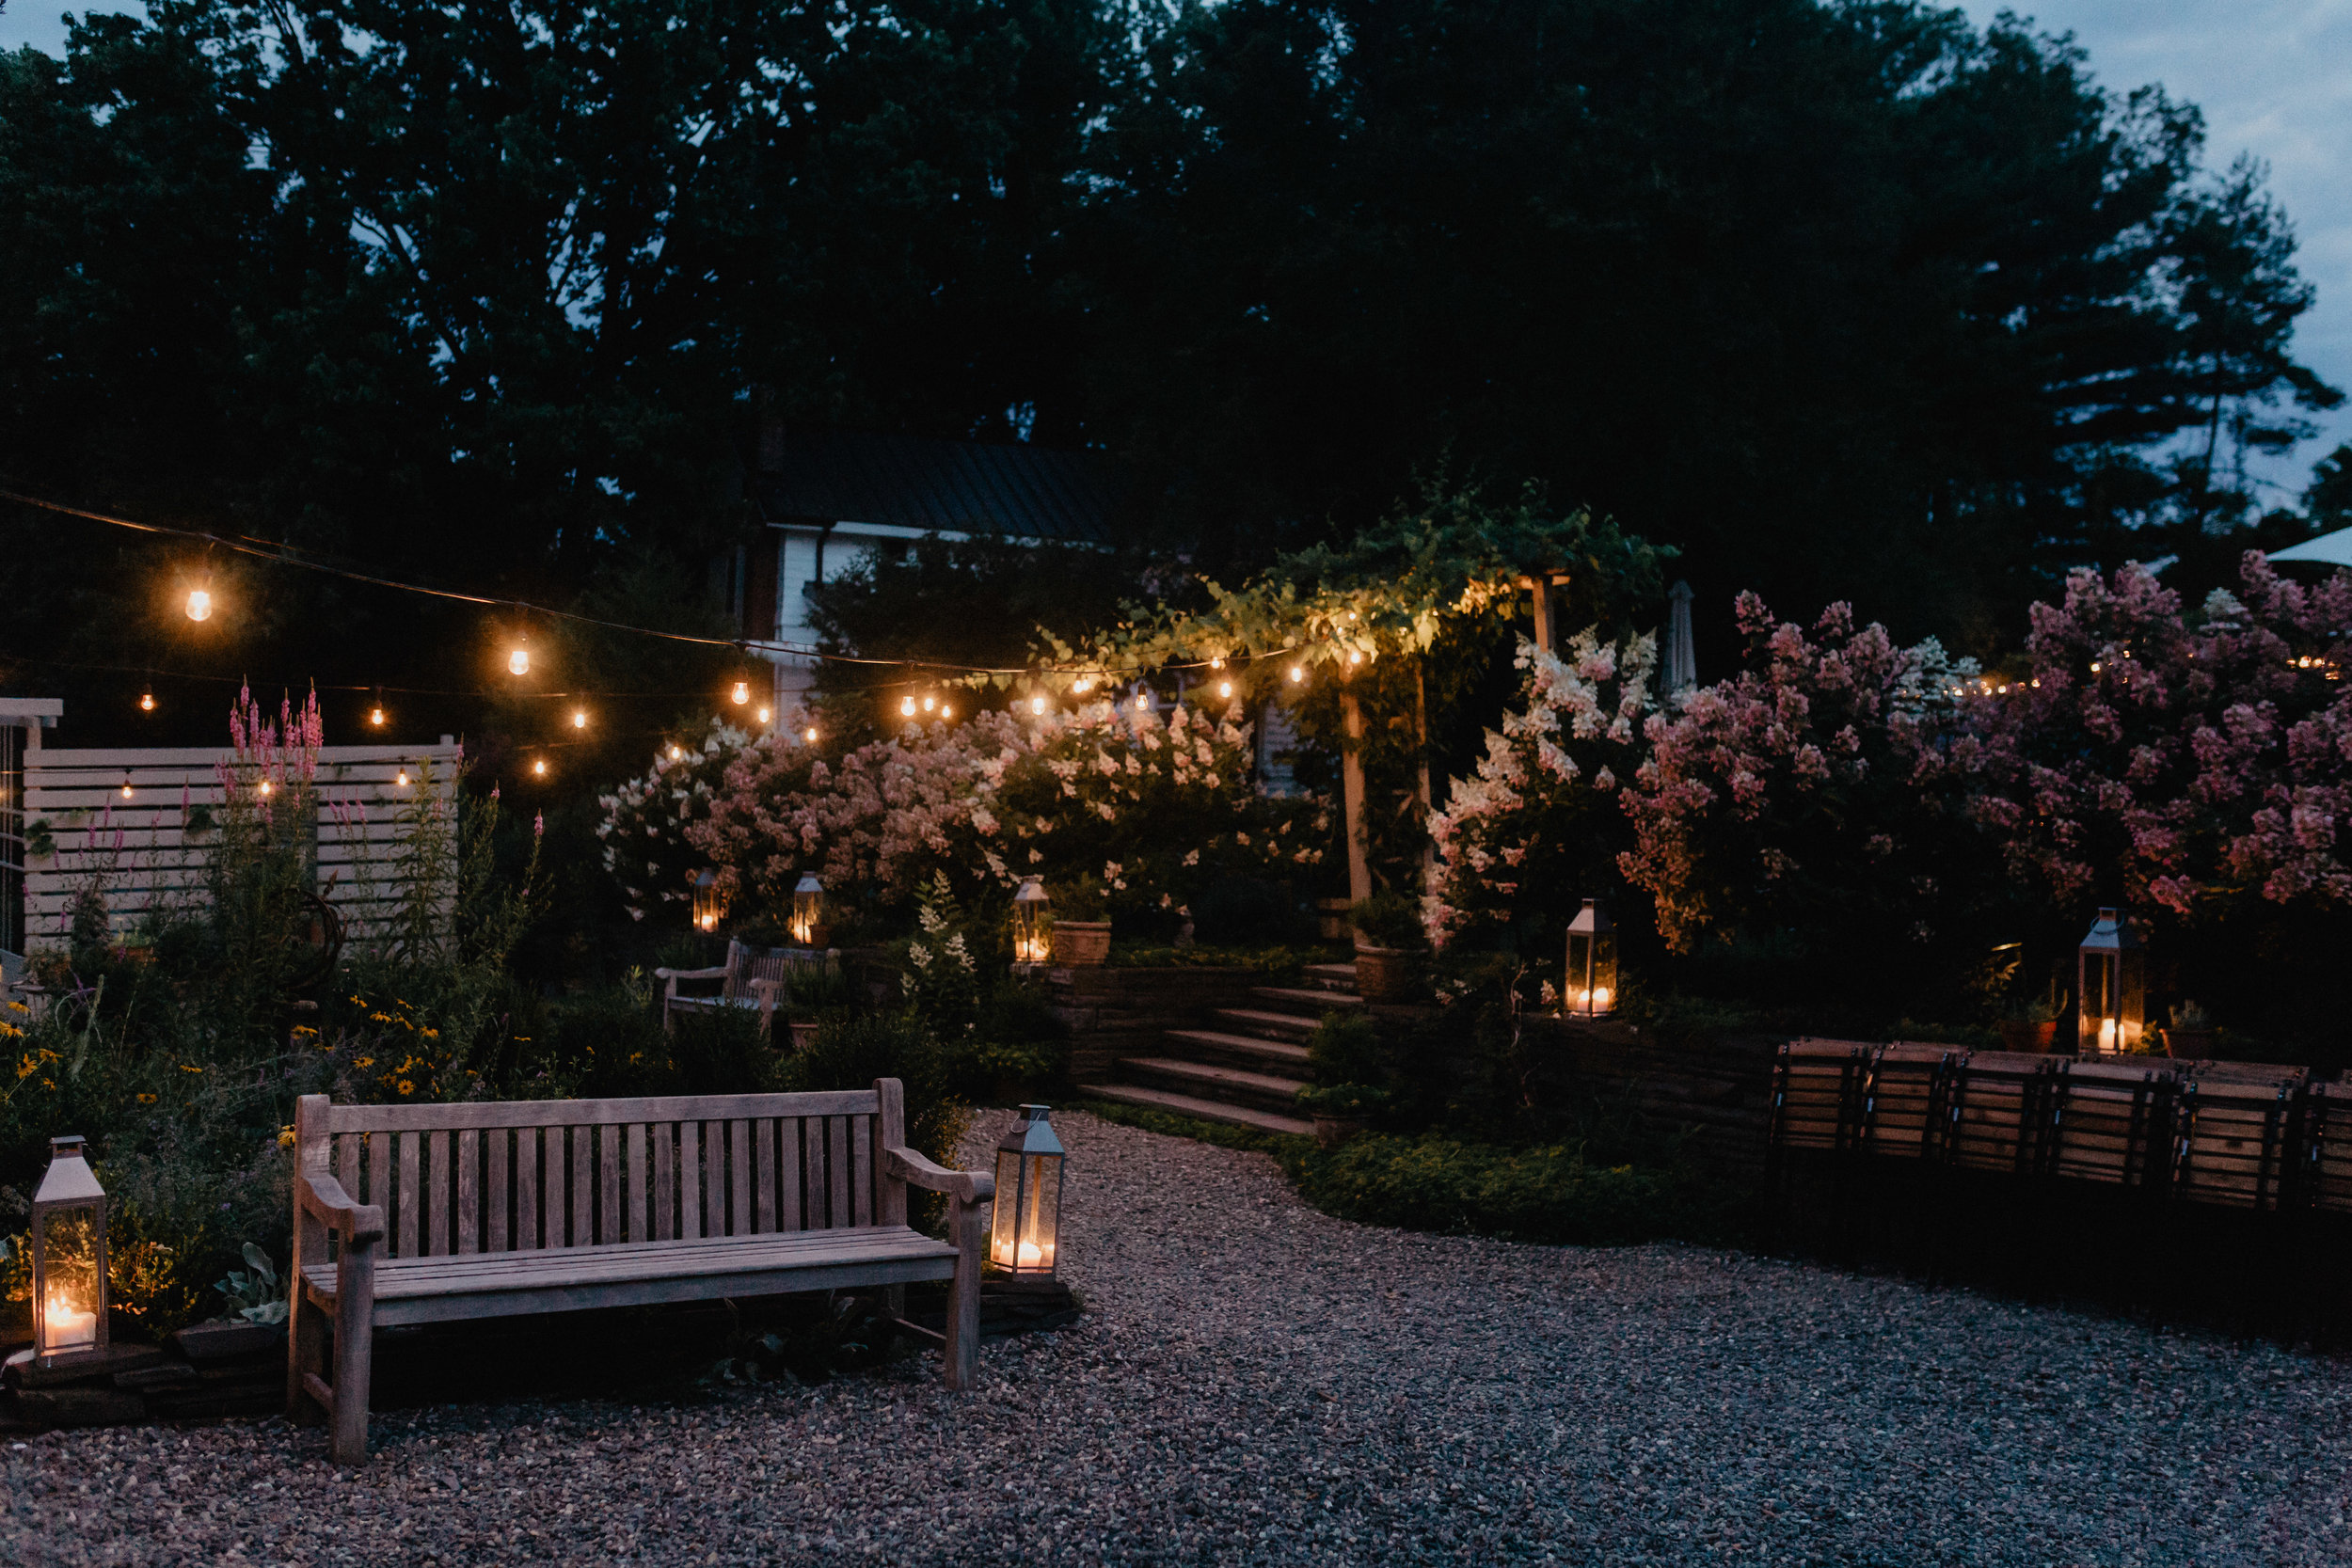 m-and-d-farm-wedding-120.jpg